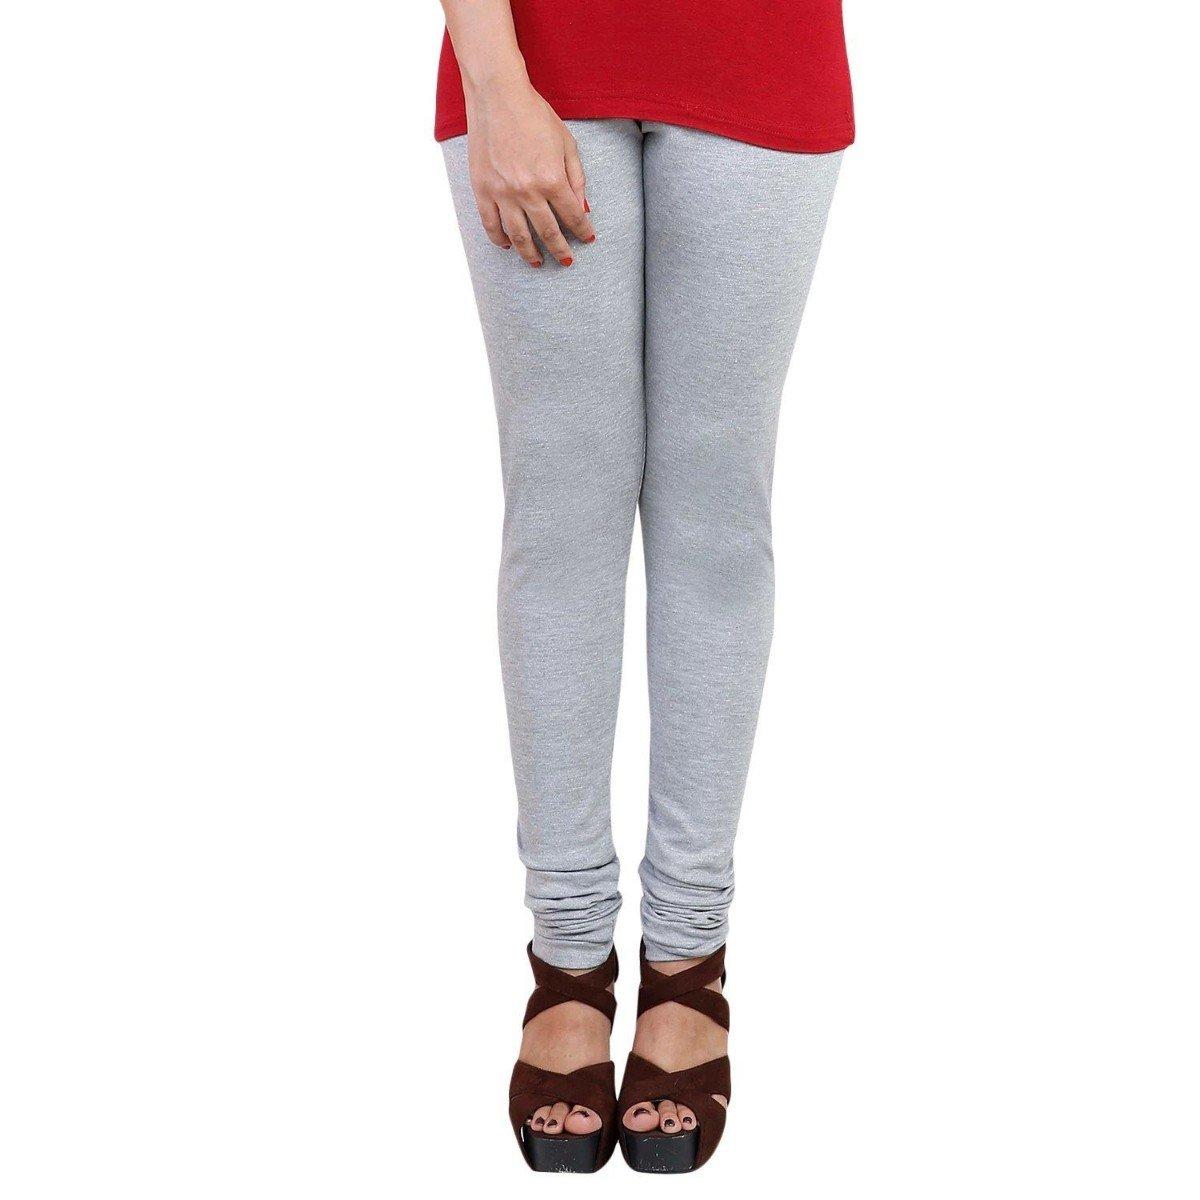 c22d09040191b Vaishno Garments Miyani Women's Leggings (Free Size, Light Grey):  Amazon.in: Clothing & Accessories